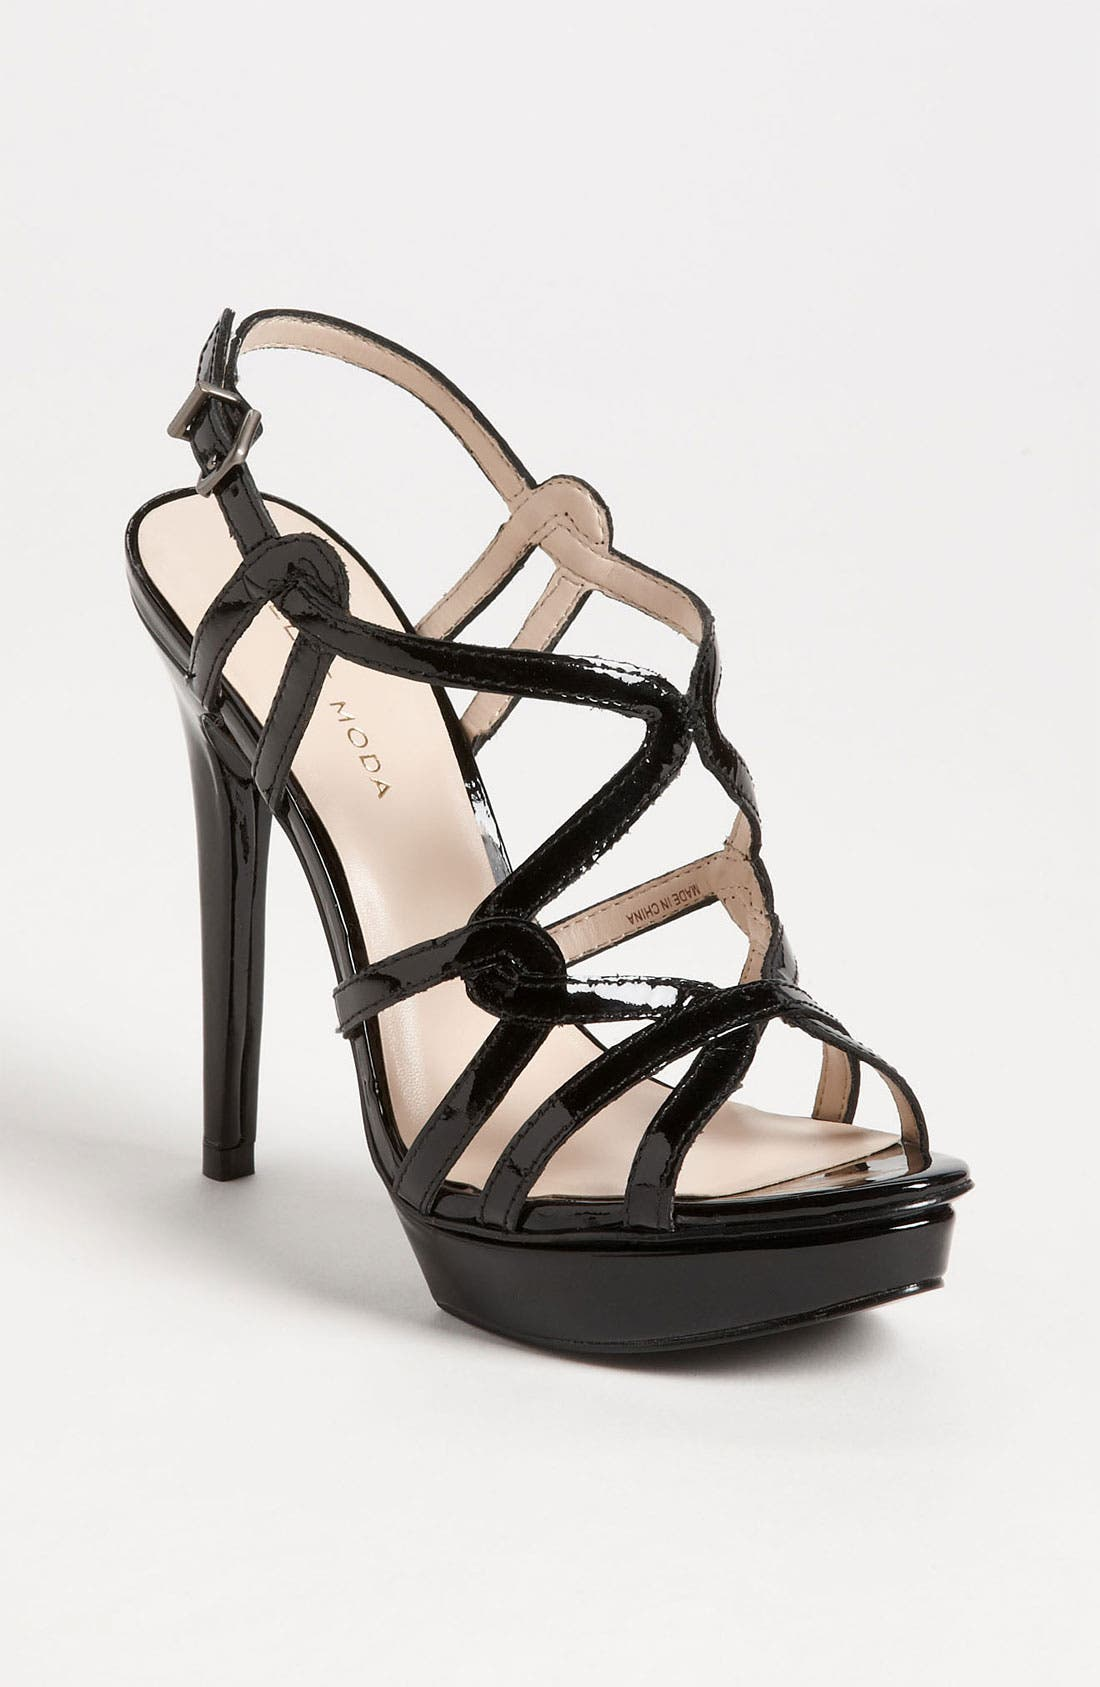 Main Image - Pelle Moda 'Flirty' Sandal